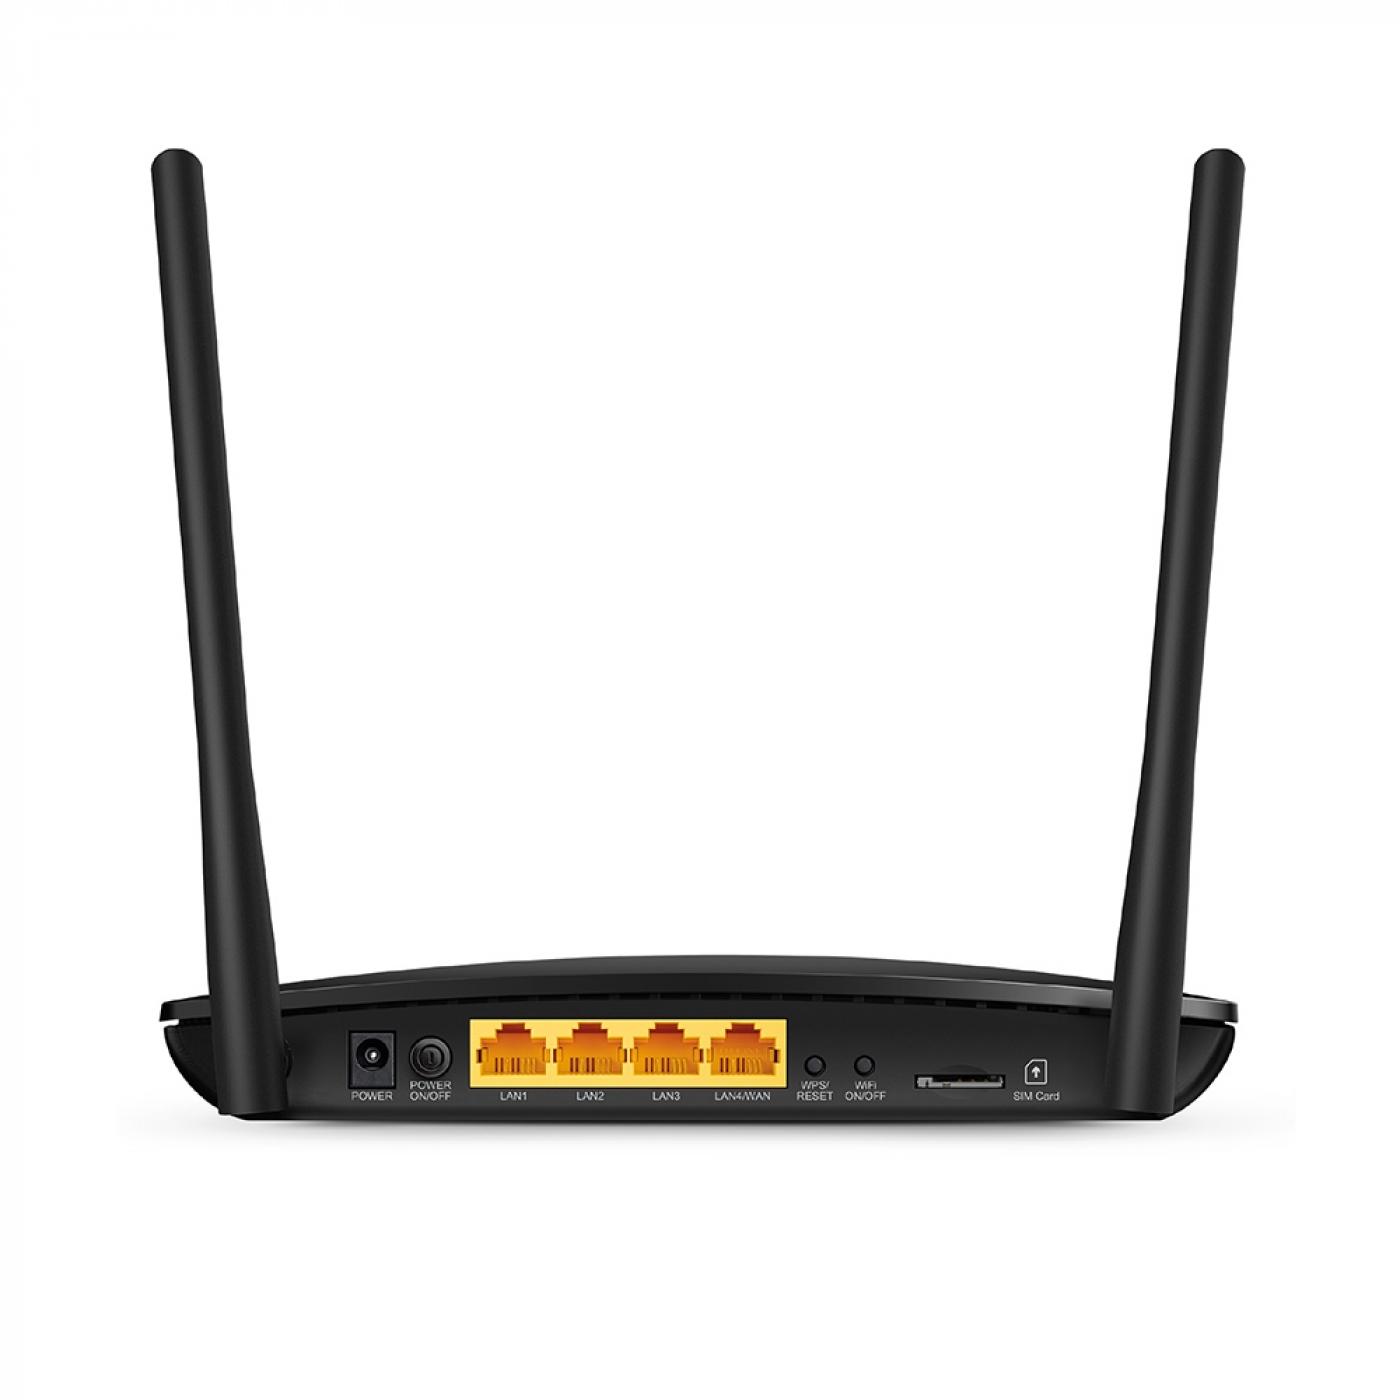 tp-link_tl-mr6400_4g-lte_router-02